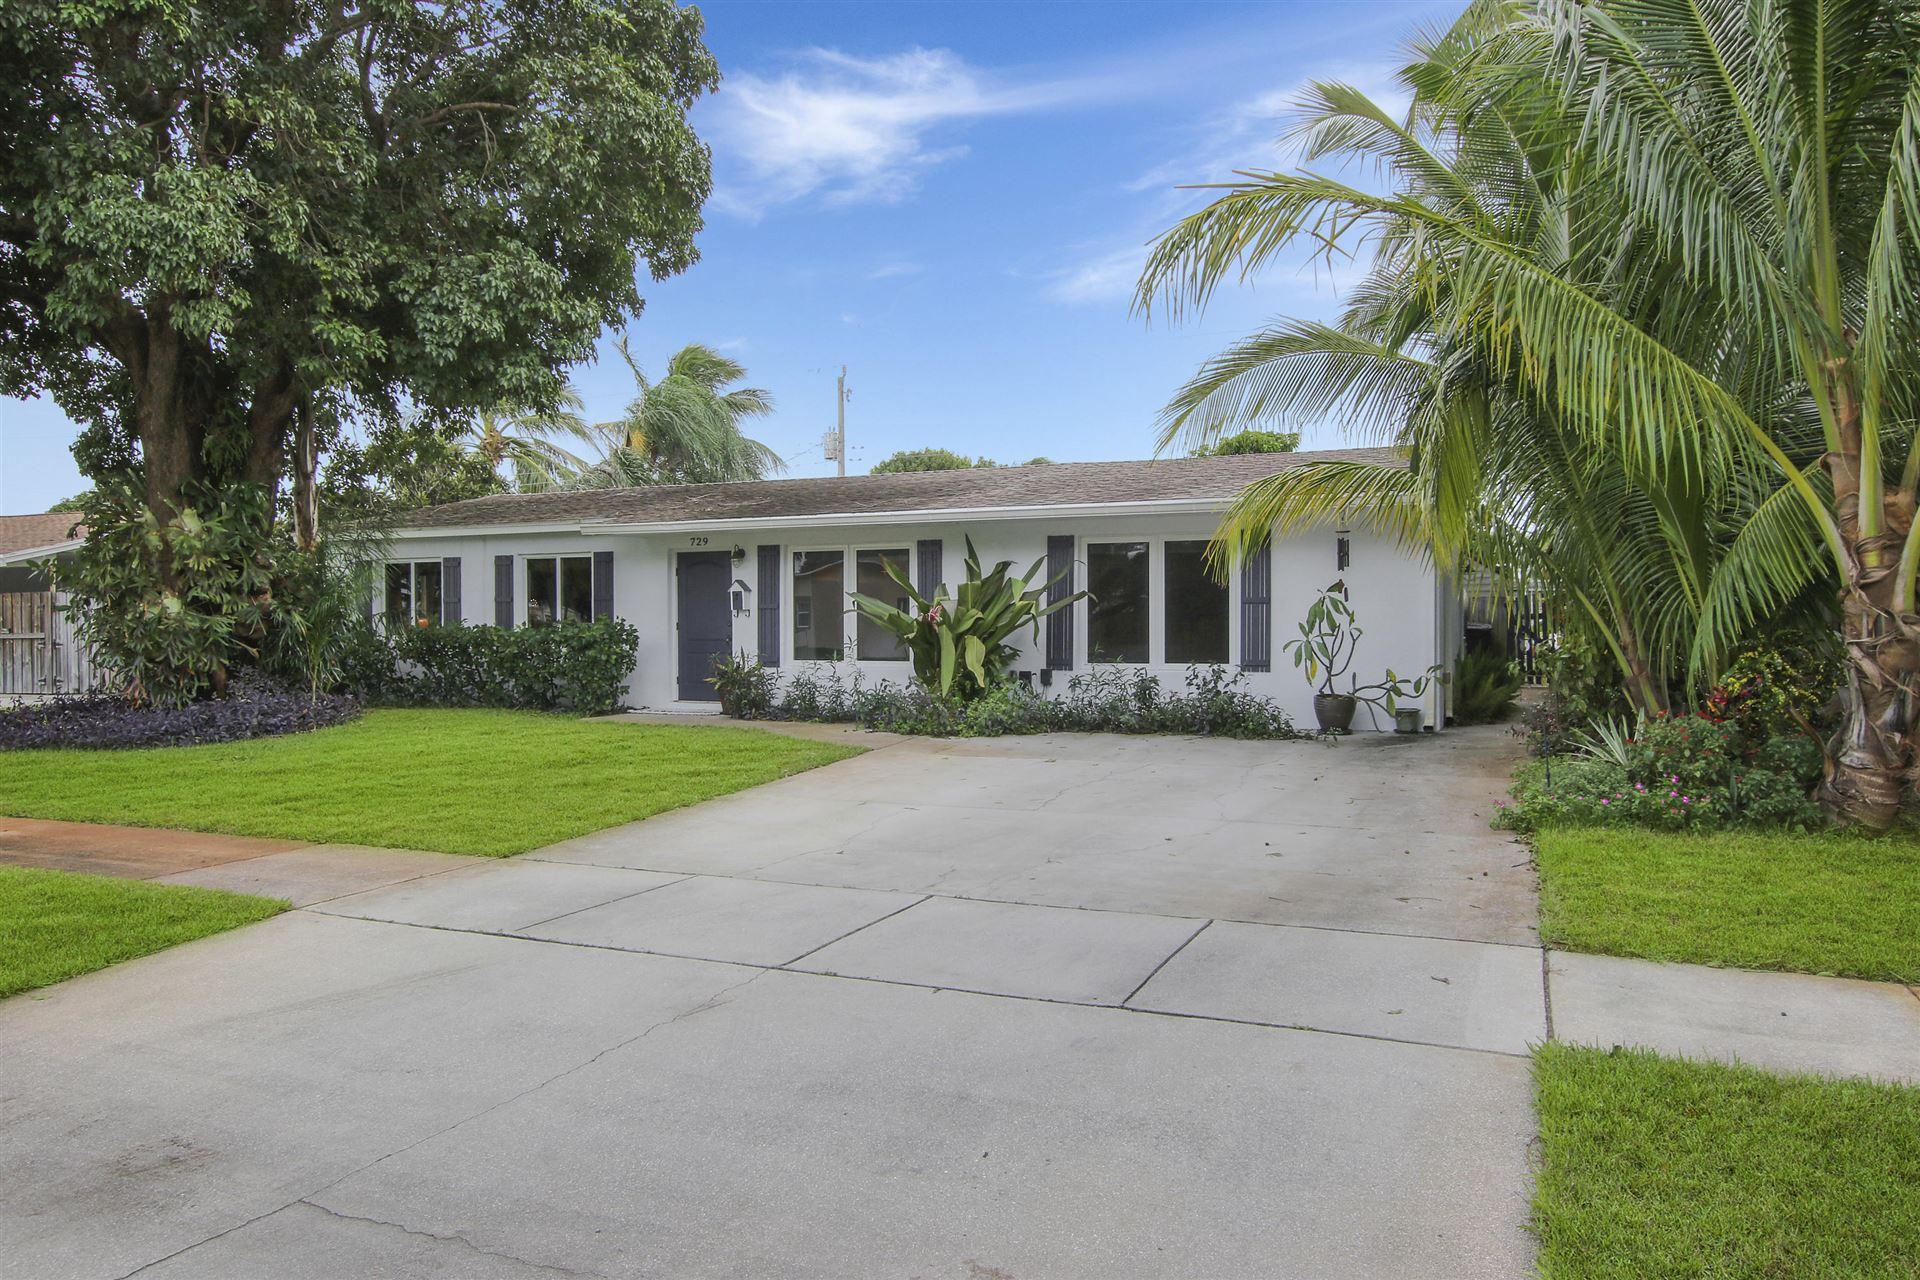 Photo of 729 Huckleberry Lane, North Palm Beach, FL 33408 (MLS # RX-10671039)